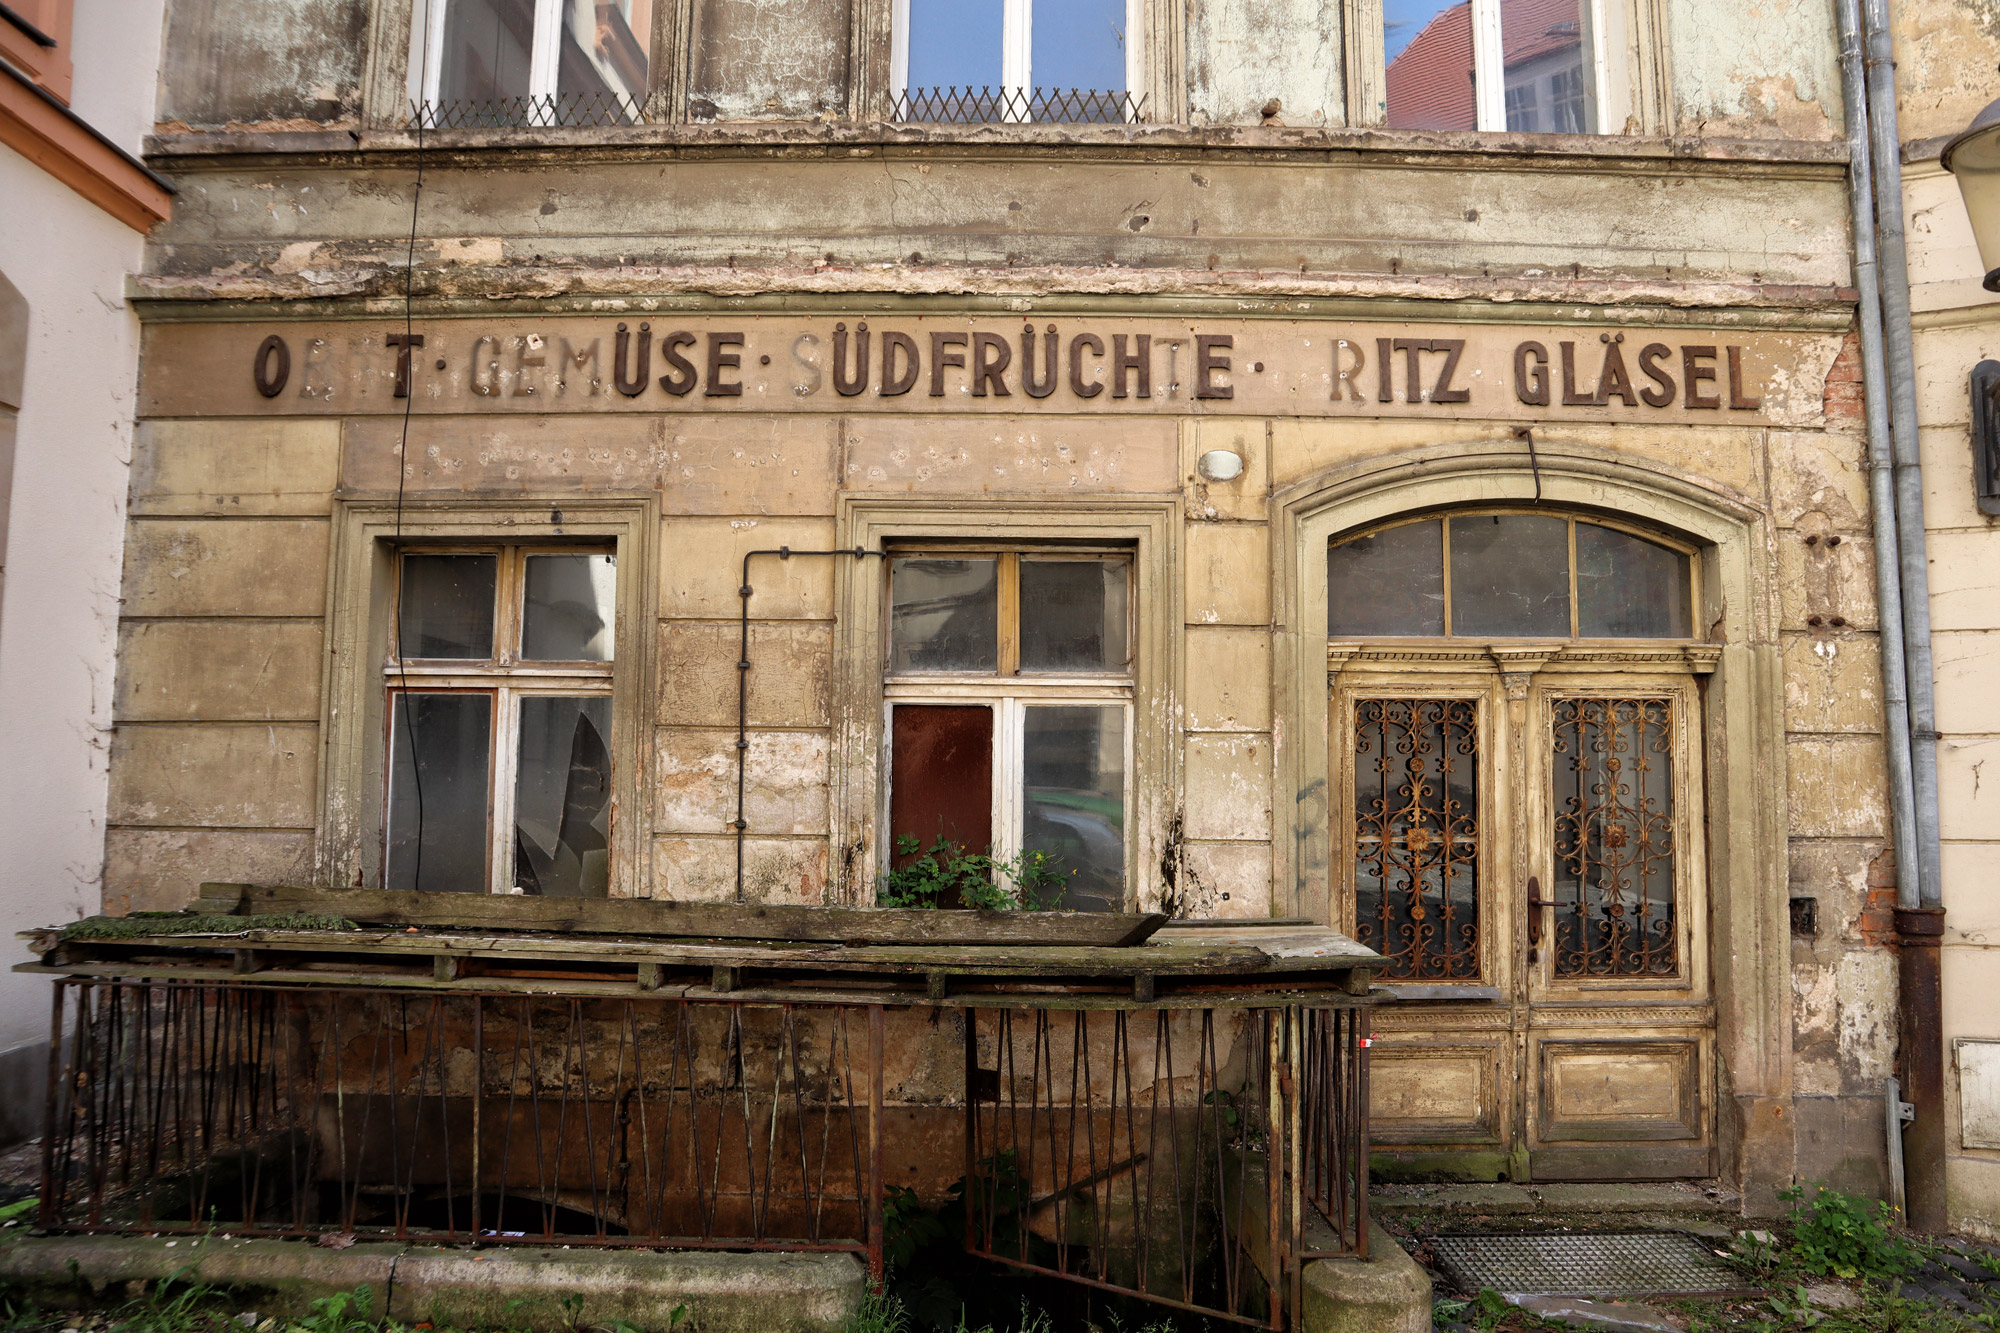 Zittau - Oude gebouwen